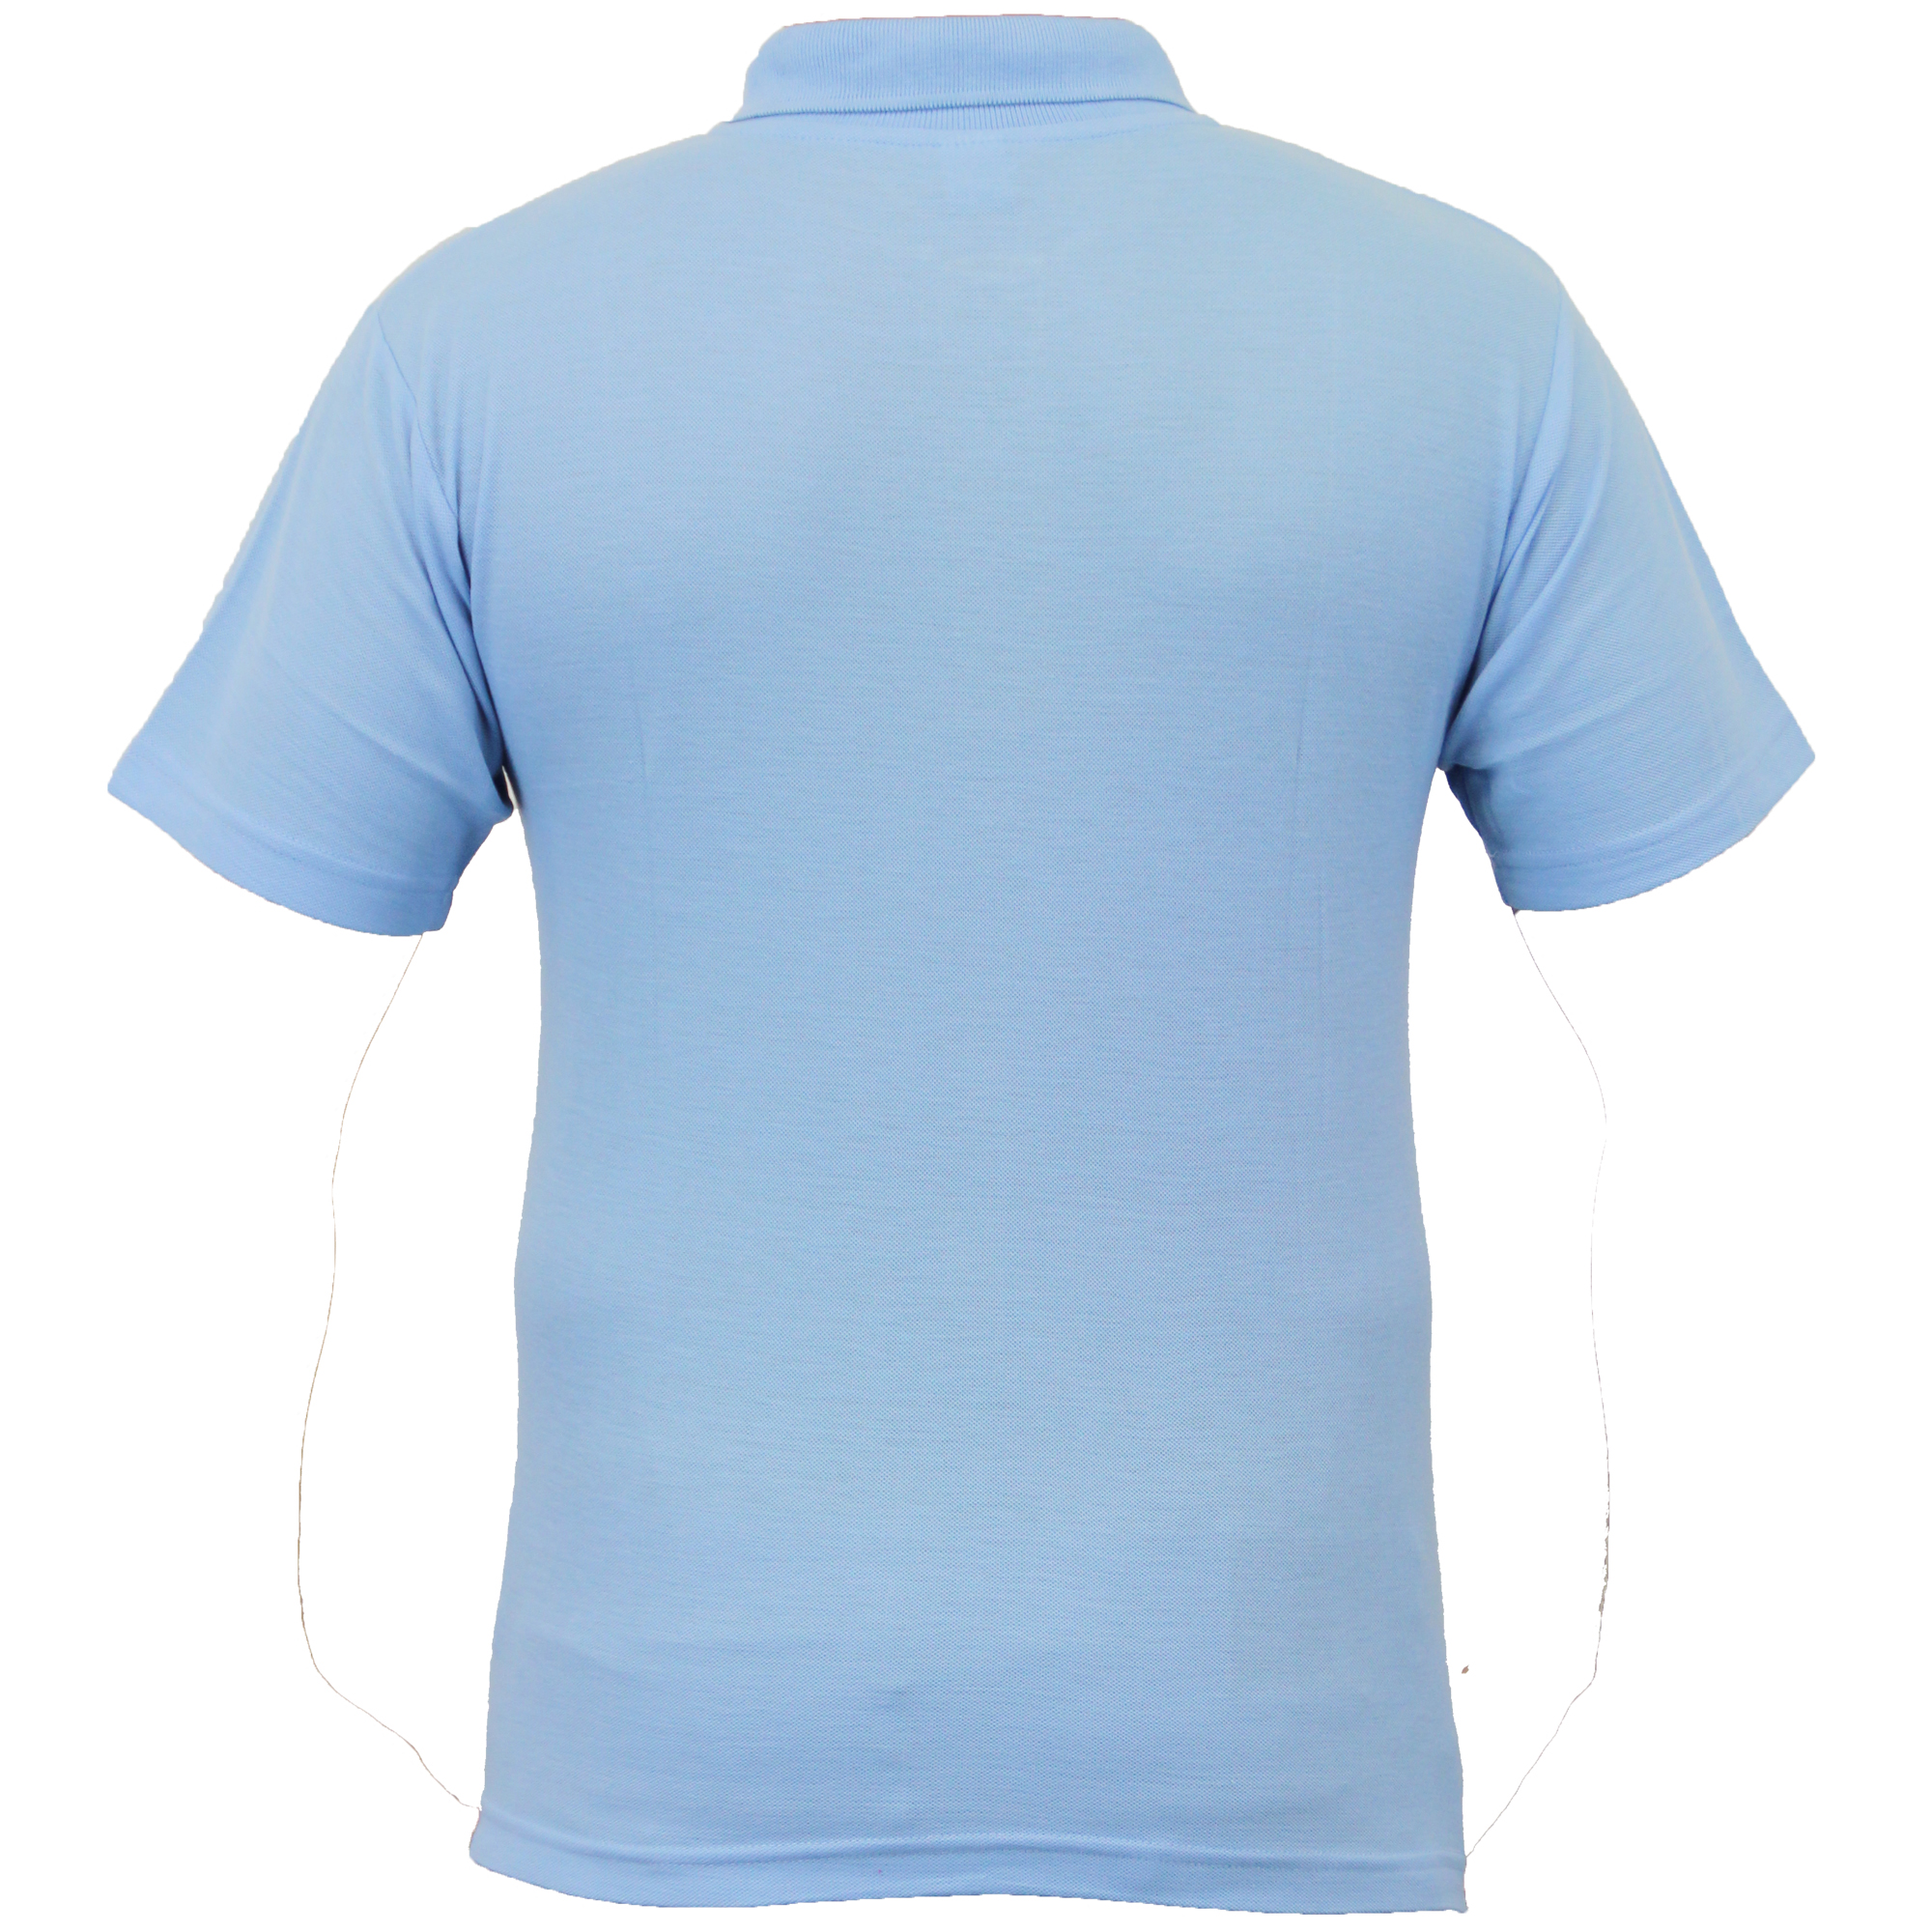 Boys 2 Pack Polo T Shirts School Uniform Pique Kids ...